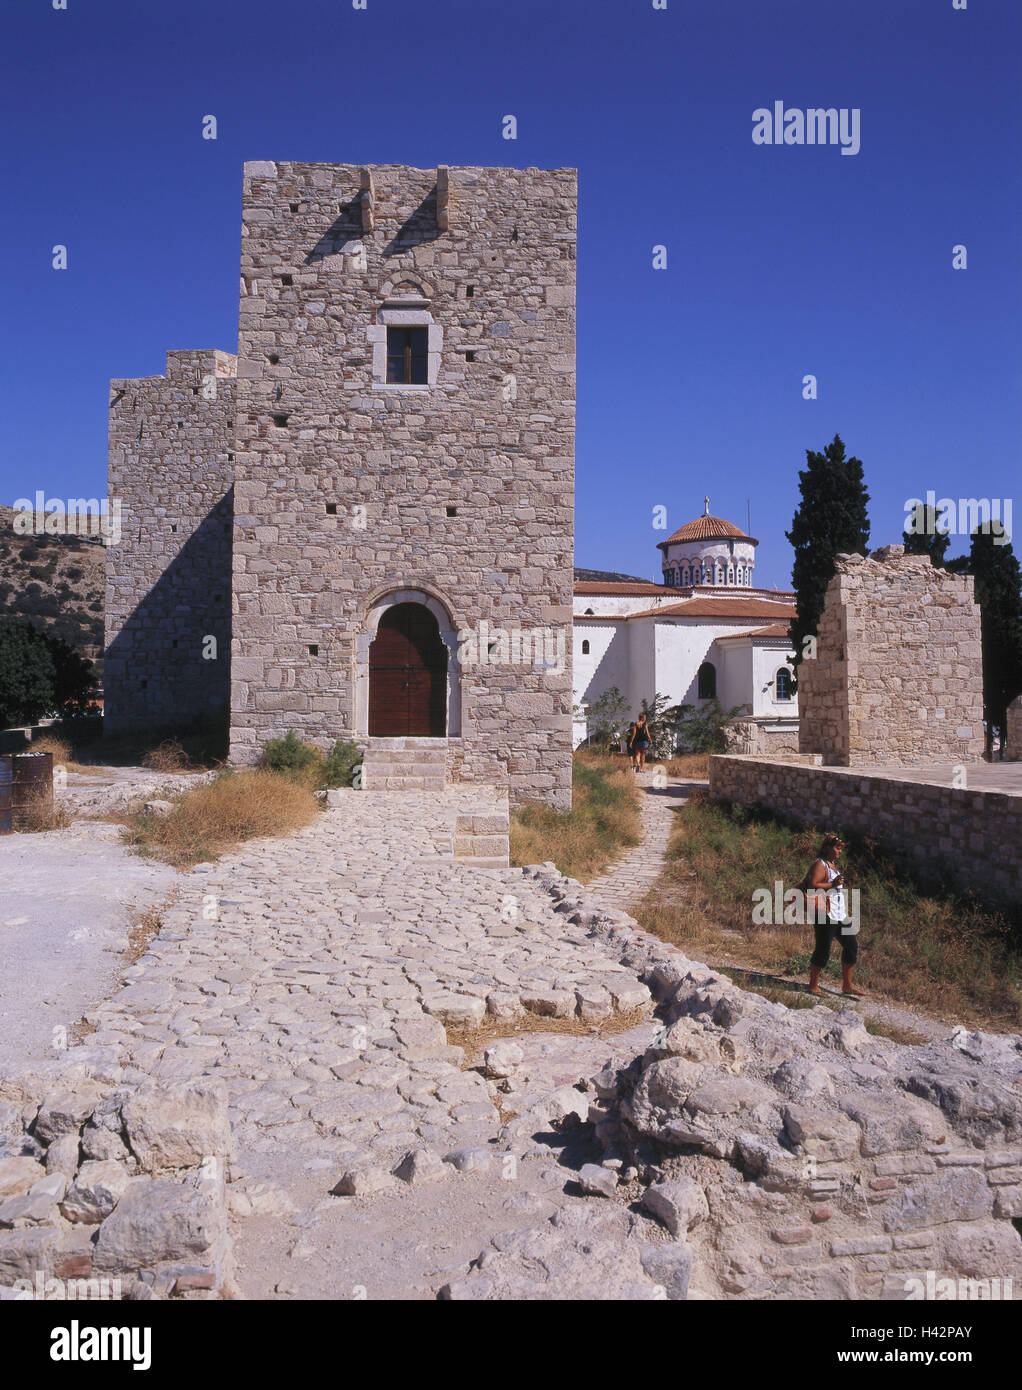 Greece, island Samos, Pythagorion, castle Logothetis, tourist, Mediterranean island, castle, castle grounds, structure, Stock Photo